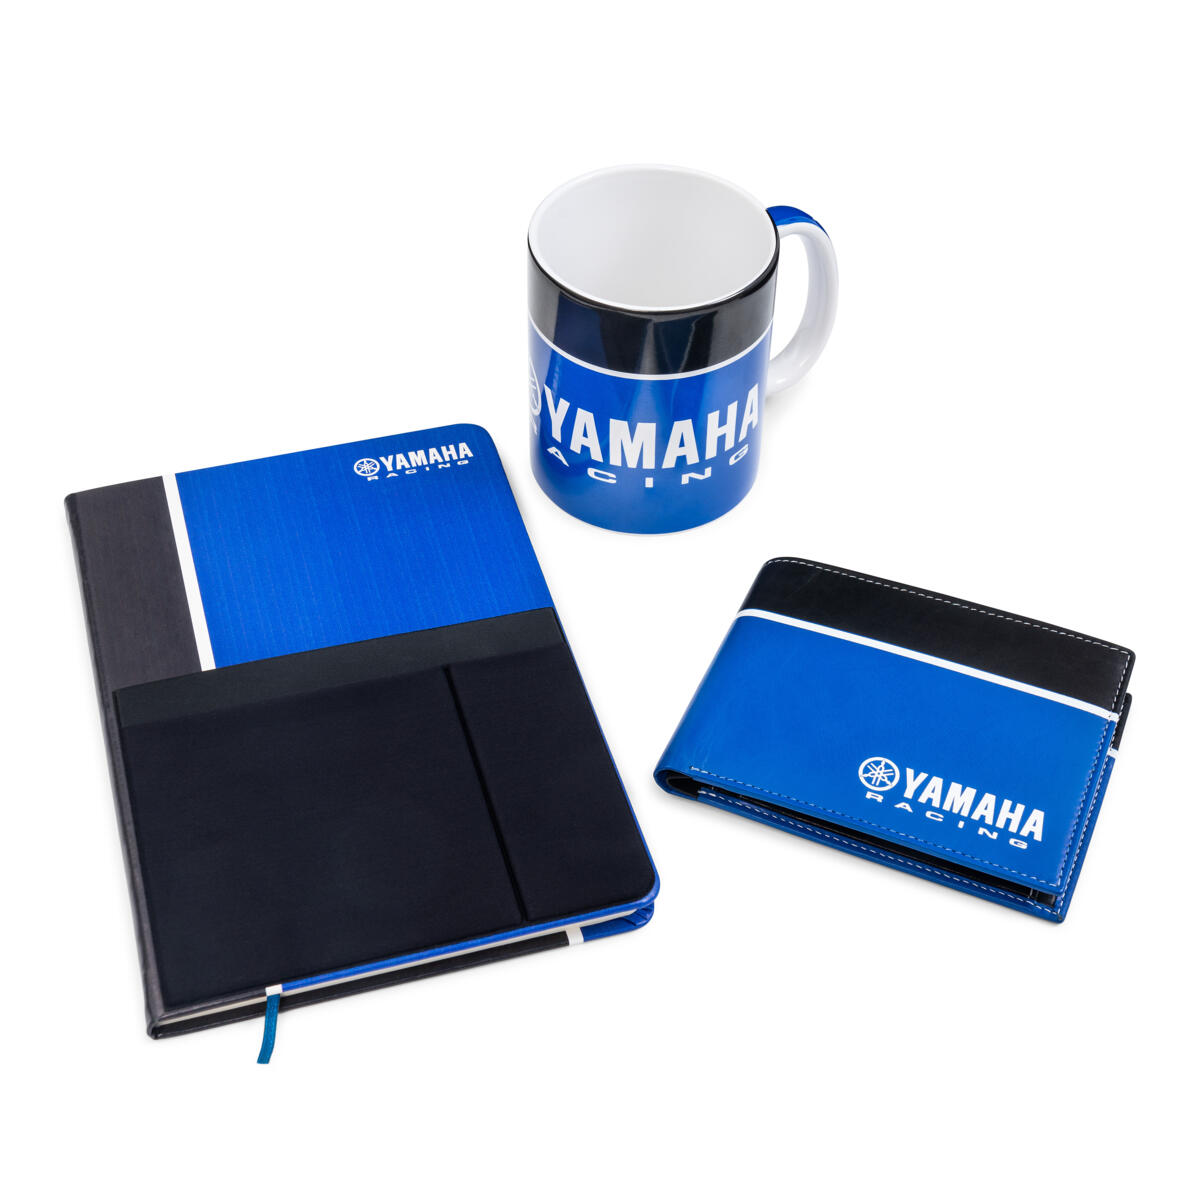 N21-JC000-B4-00-YAMAHA-RACING-LEATHER-WALLET-Studio-004_Tablet